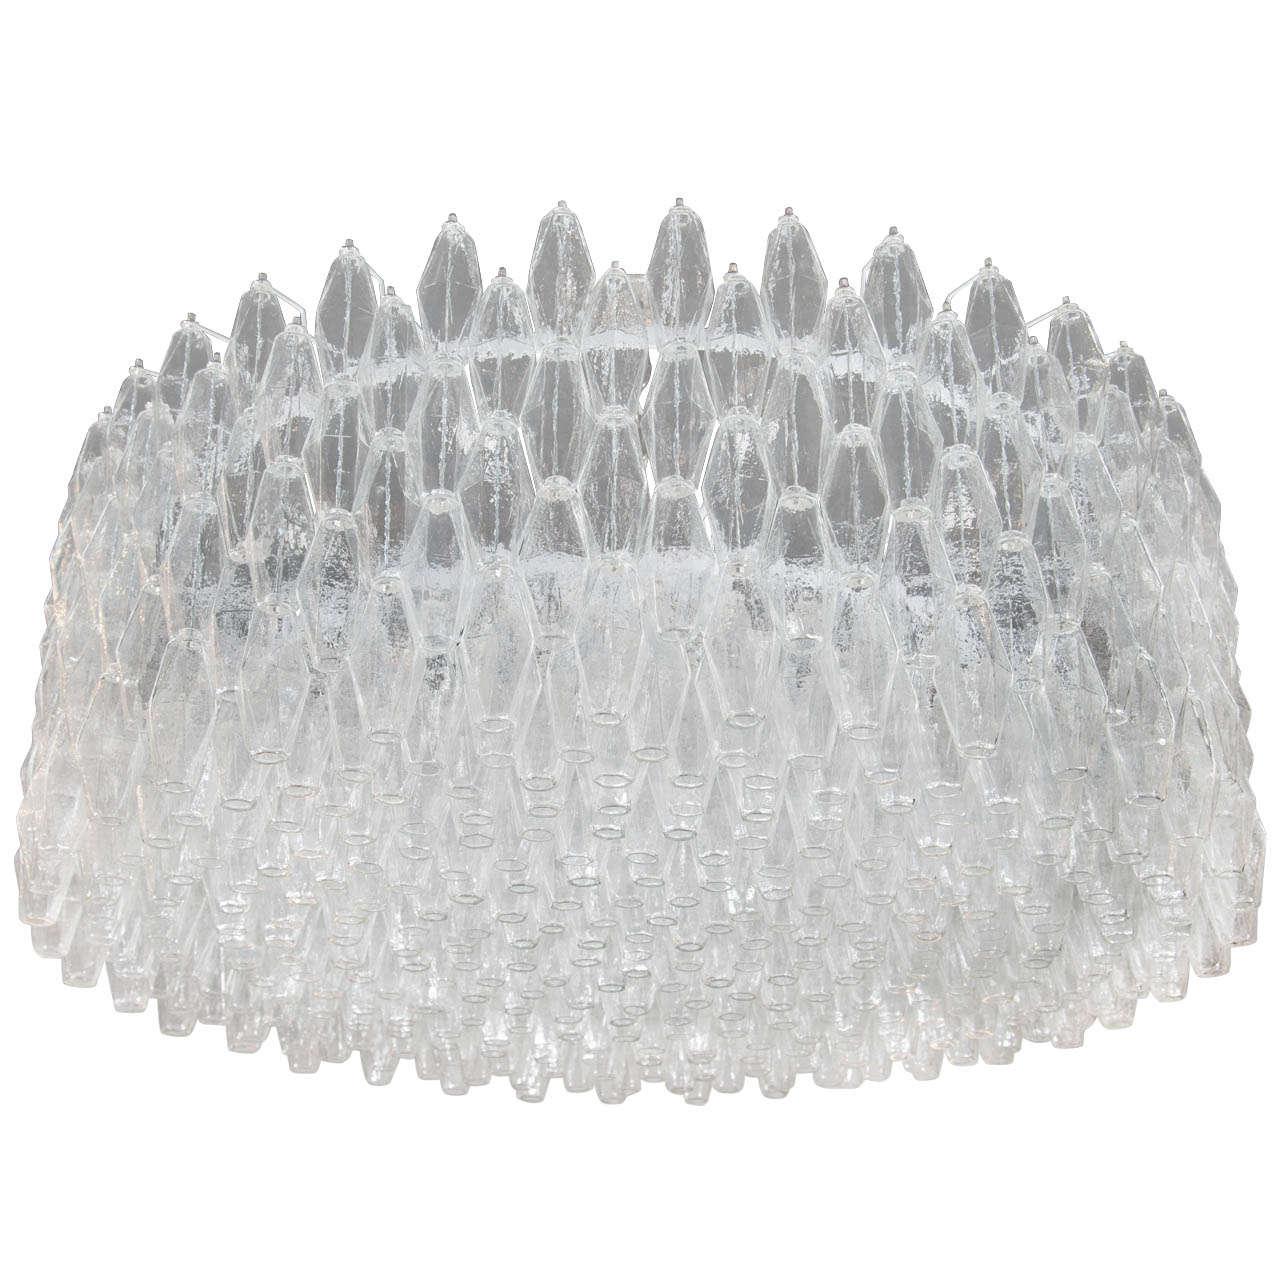 Monumental Handblown Smoked Murano Glass Polyhedral Chandelier by Venini